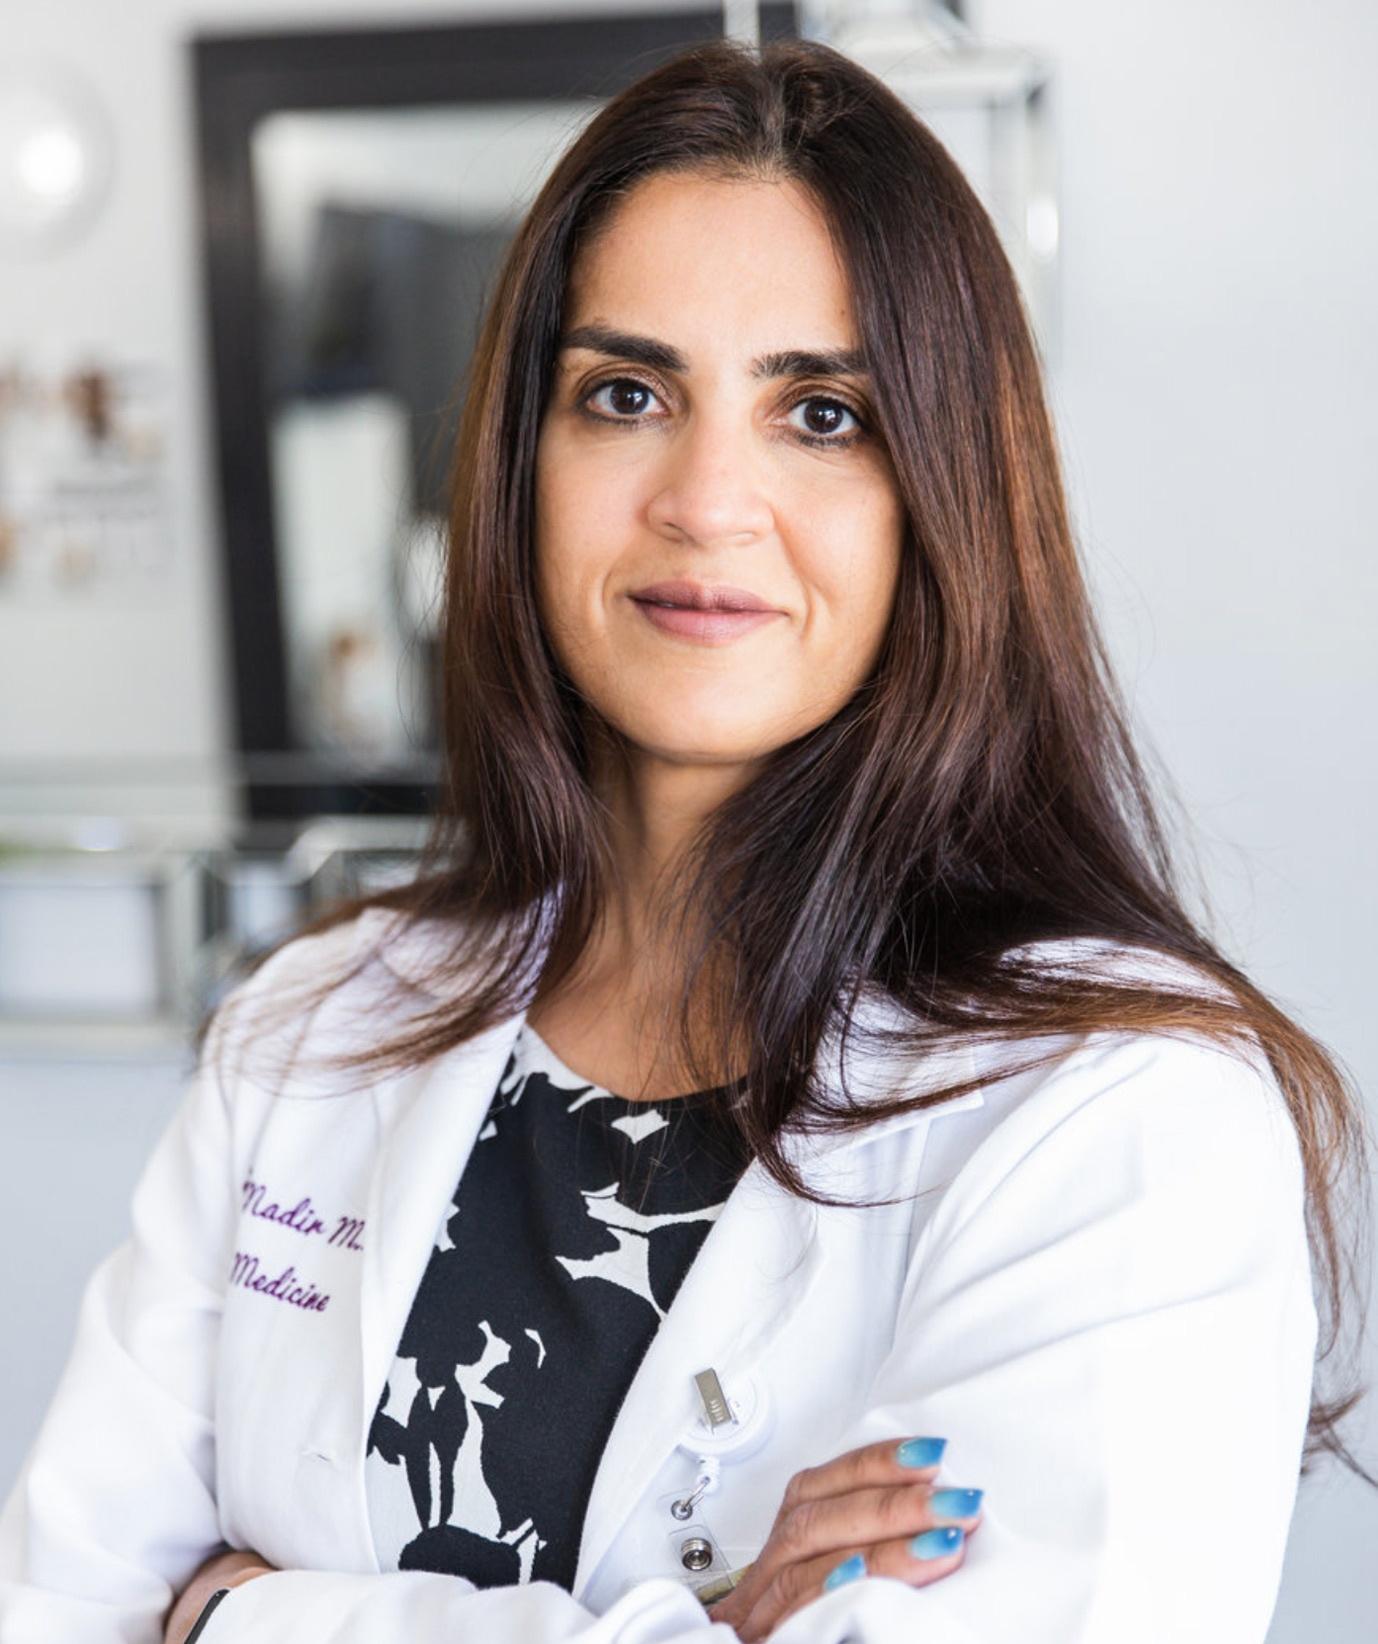 dr-nadir-medical-spa-chandler-az